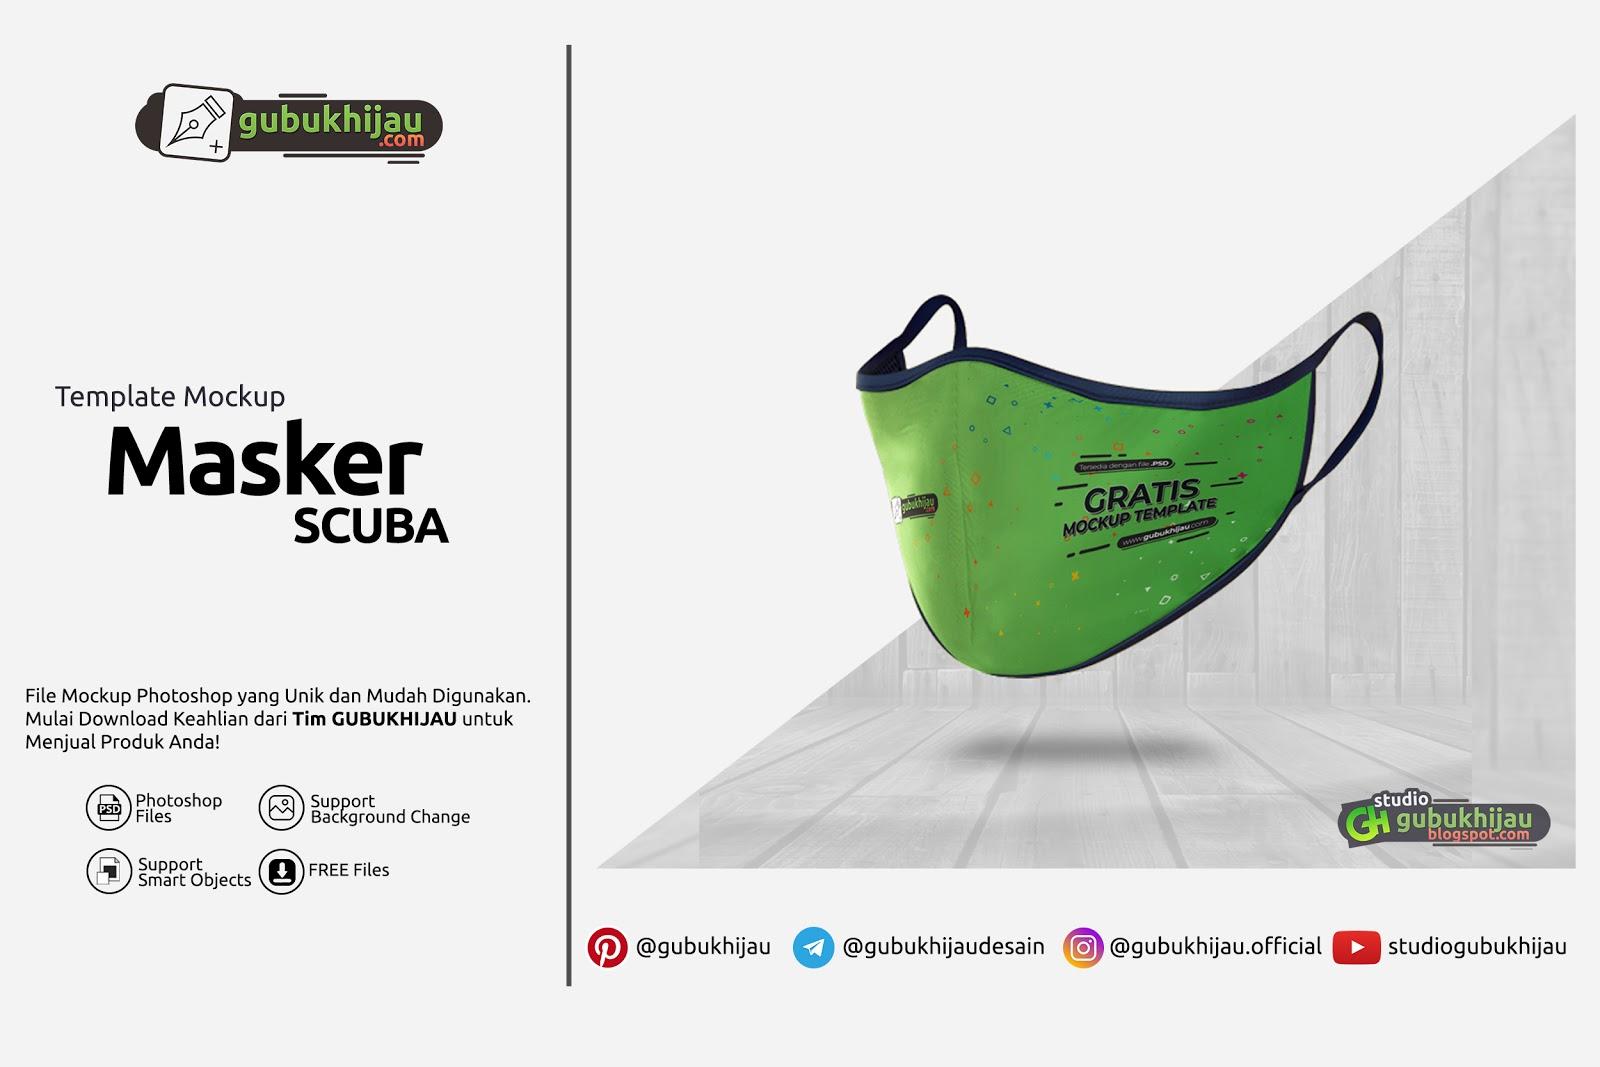 Mockup Masker Scuba by gubukhijau